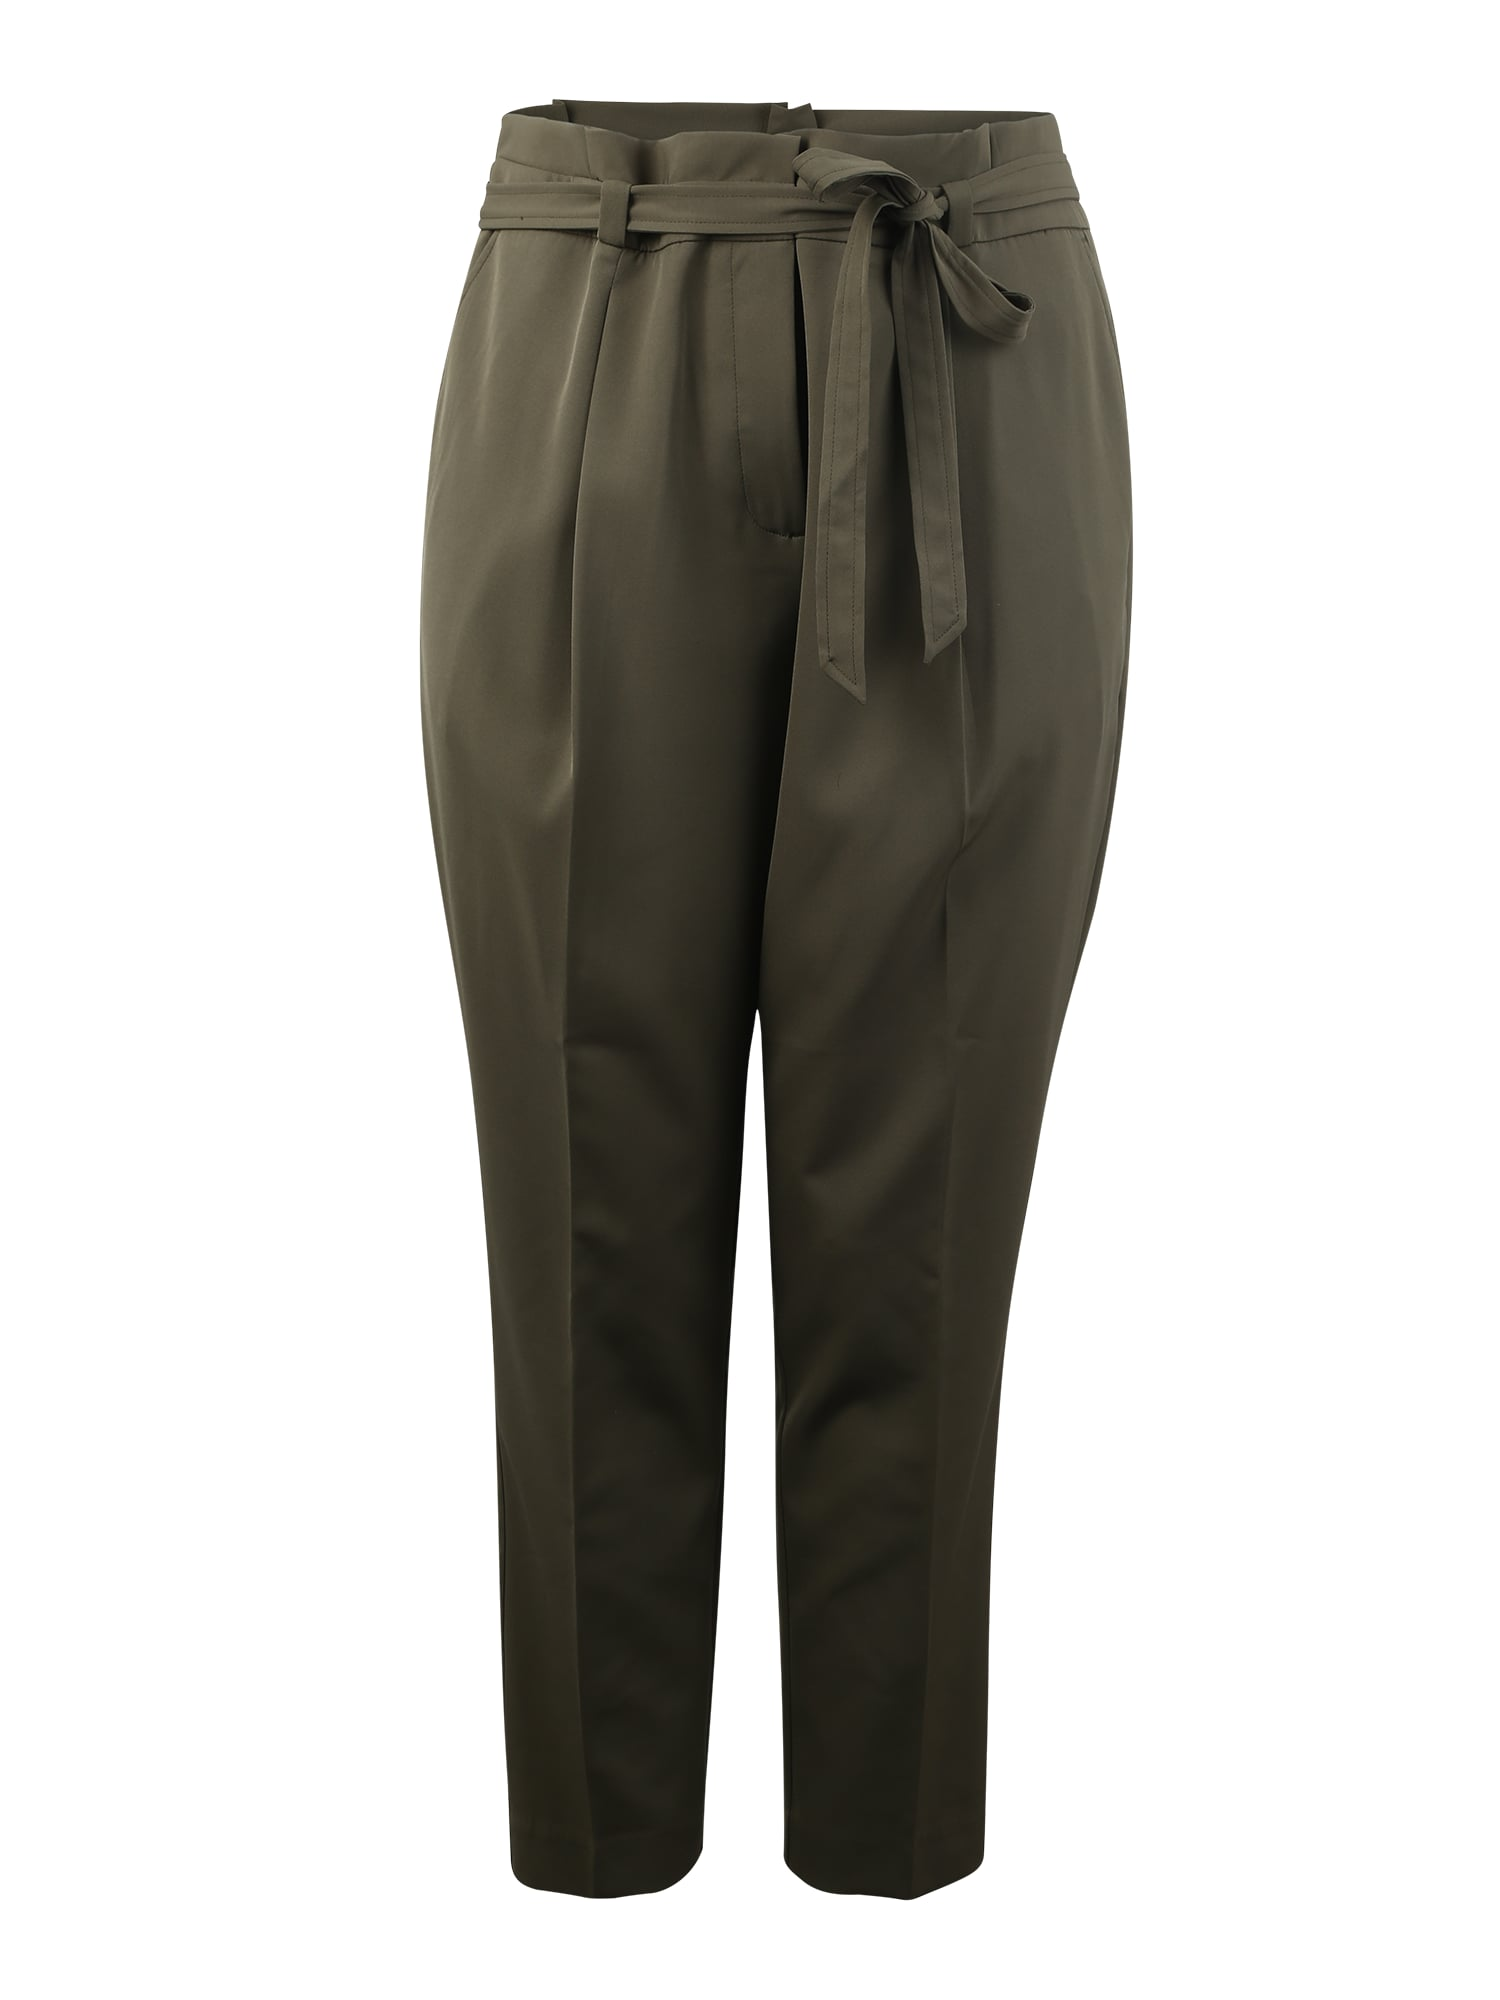 Kalhoty se sklady v pase MILLER  khaki New Look Curves